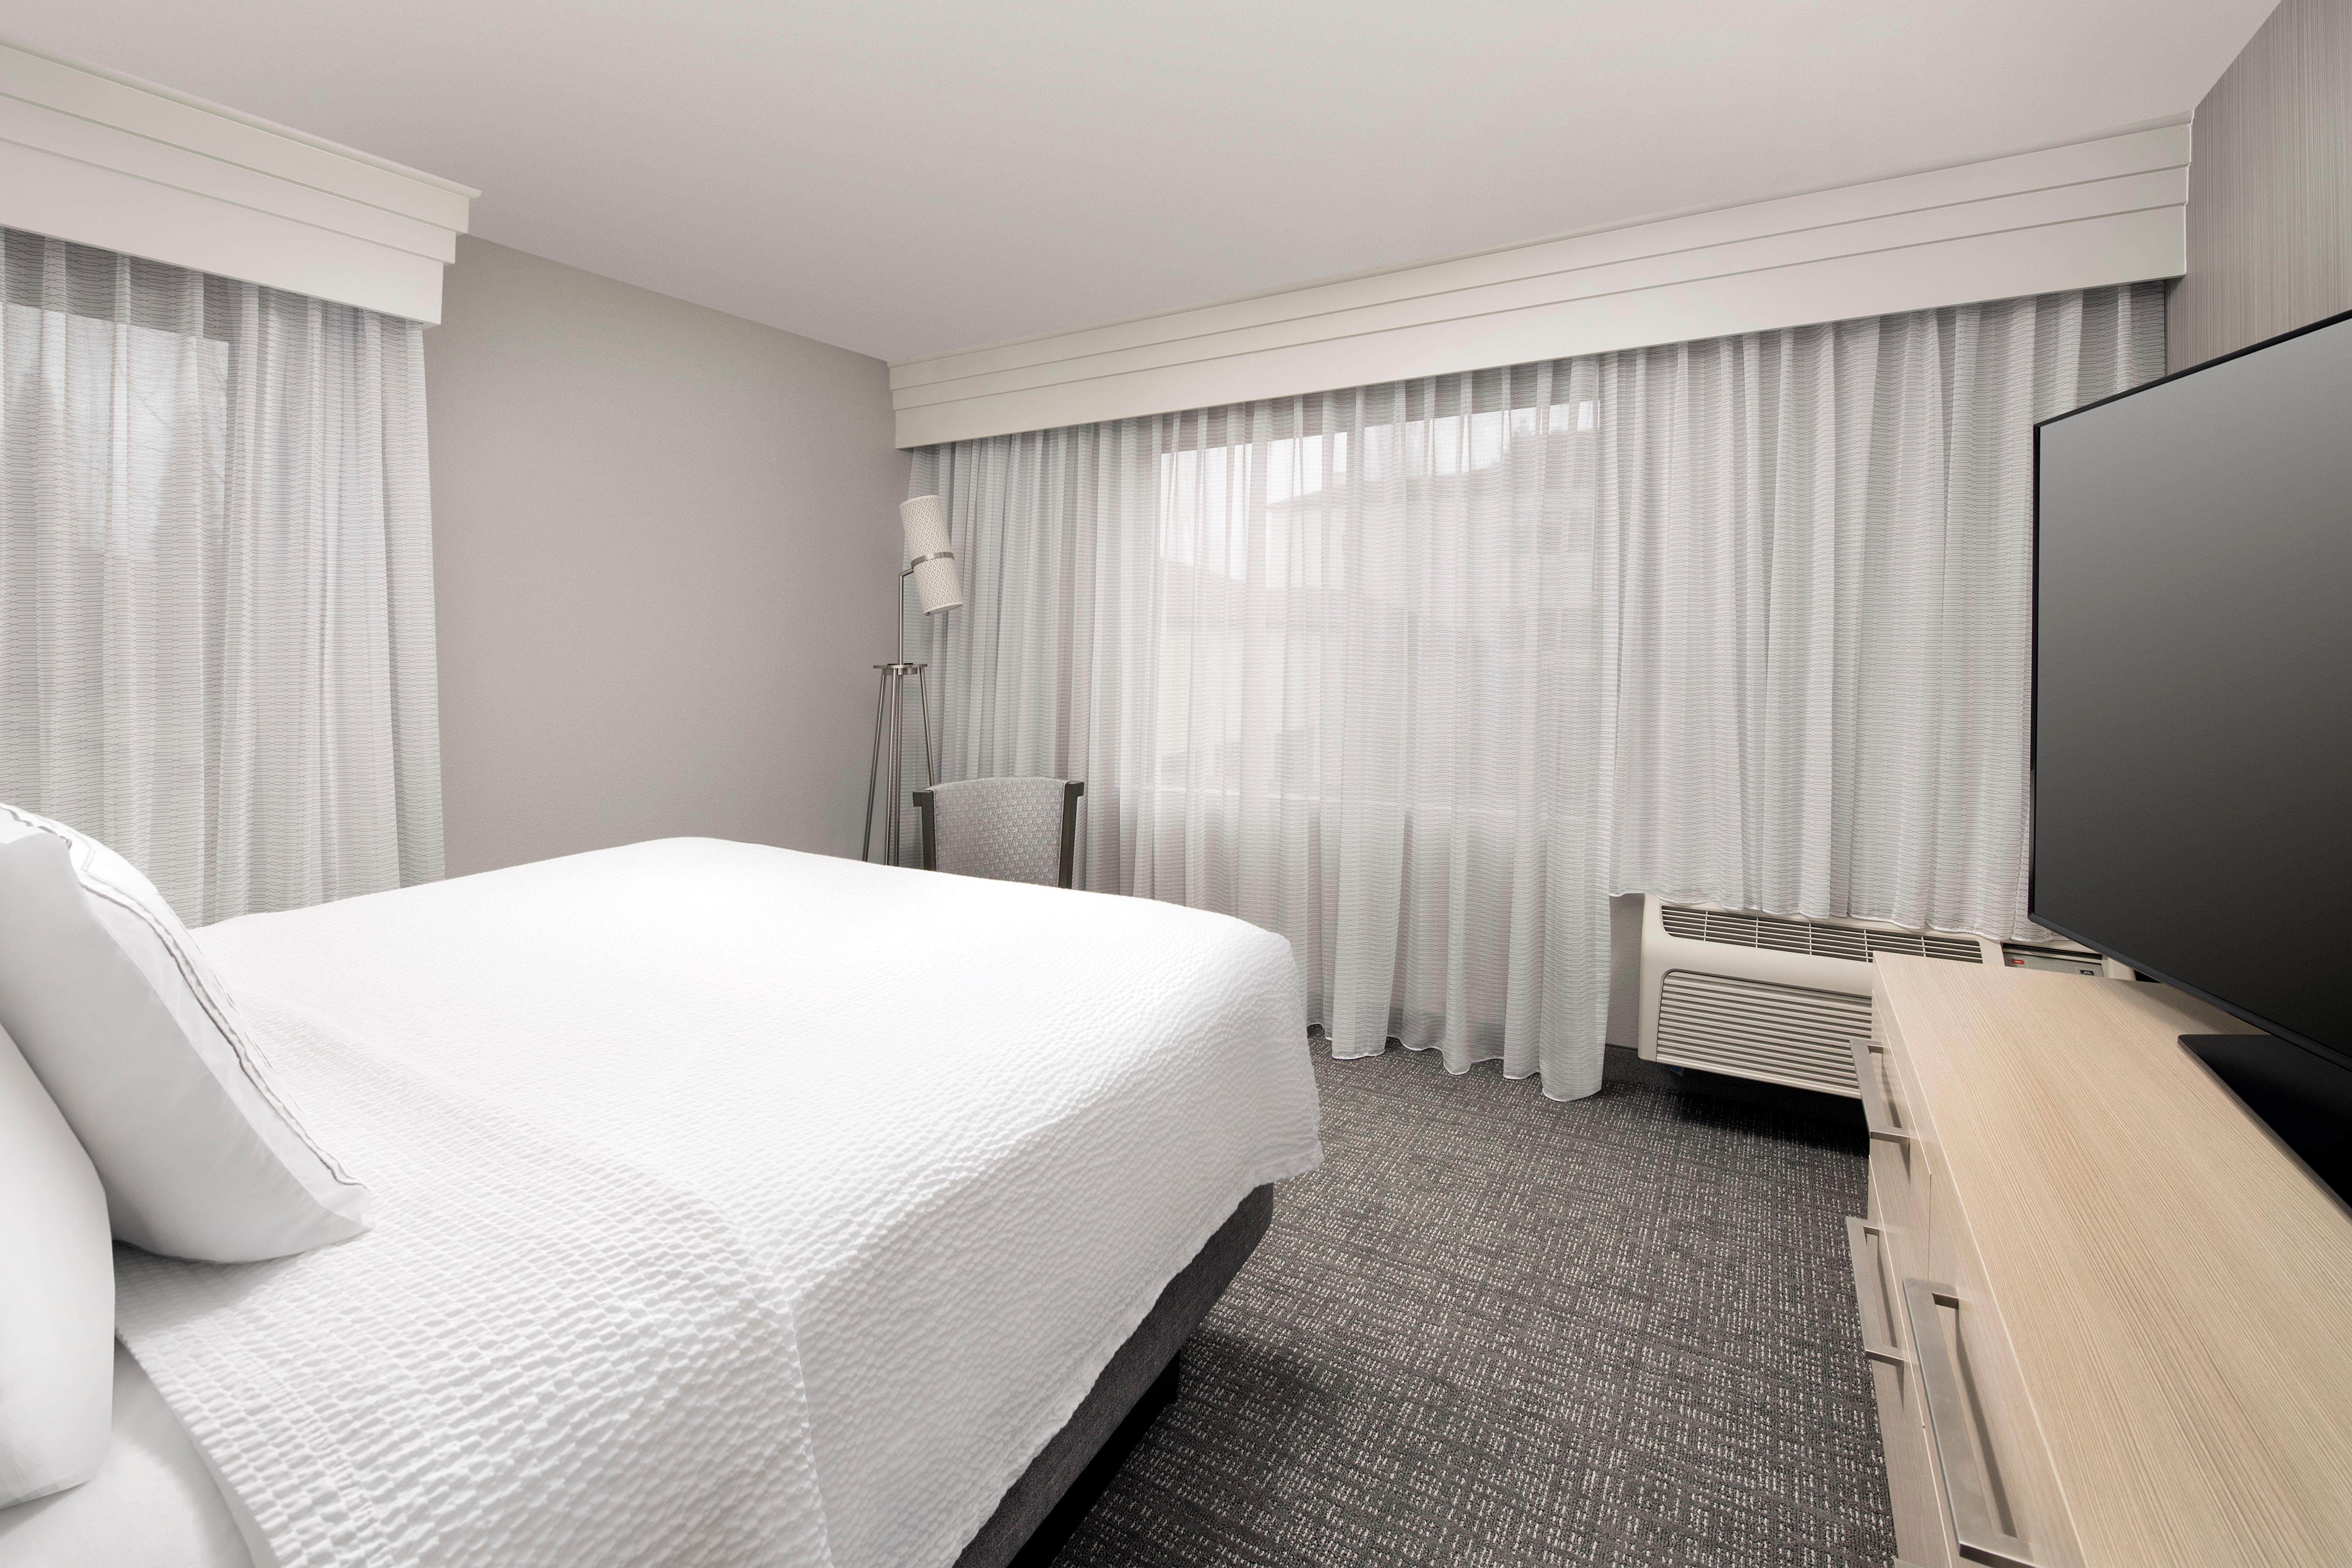 Courtyard by marriott portland hillsboro hillsboro oregon - 2 bedroom suites portland oregon ...